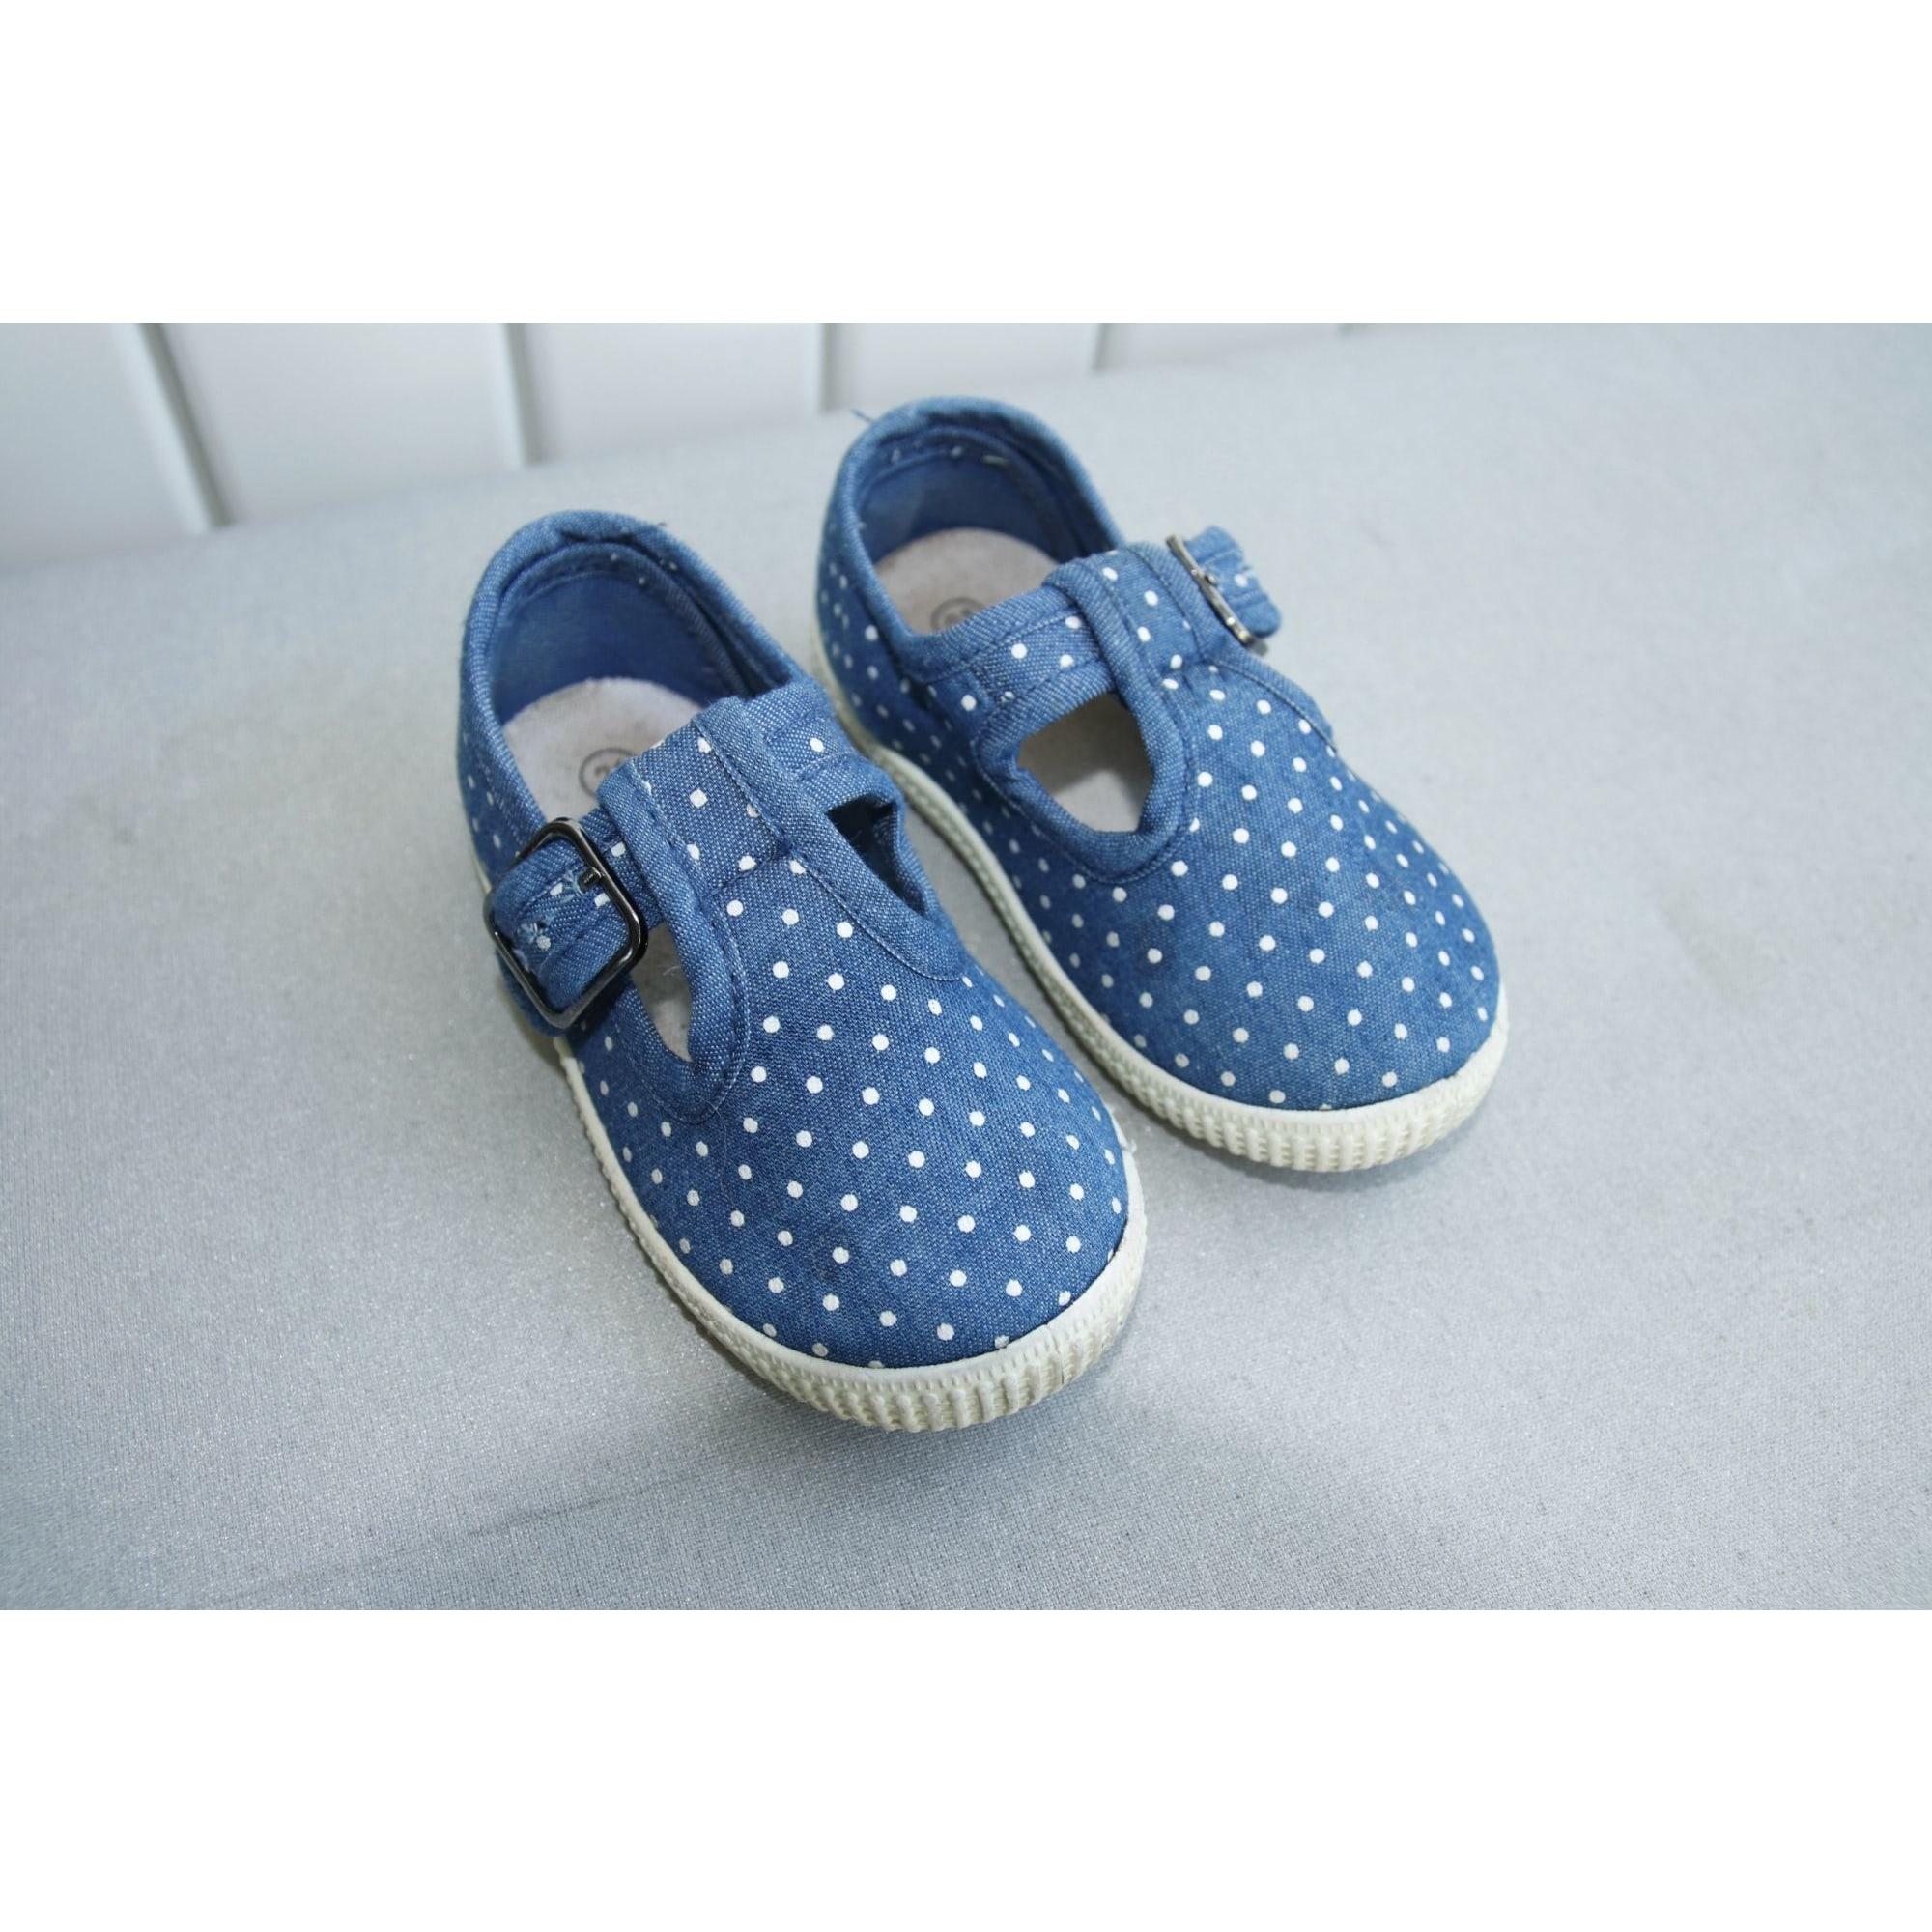 Chaussures à boucle PAT ET RIPATON Bleu, bleu marine, bleu turquoise